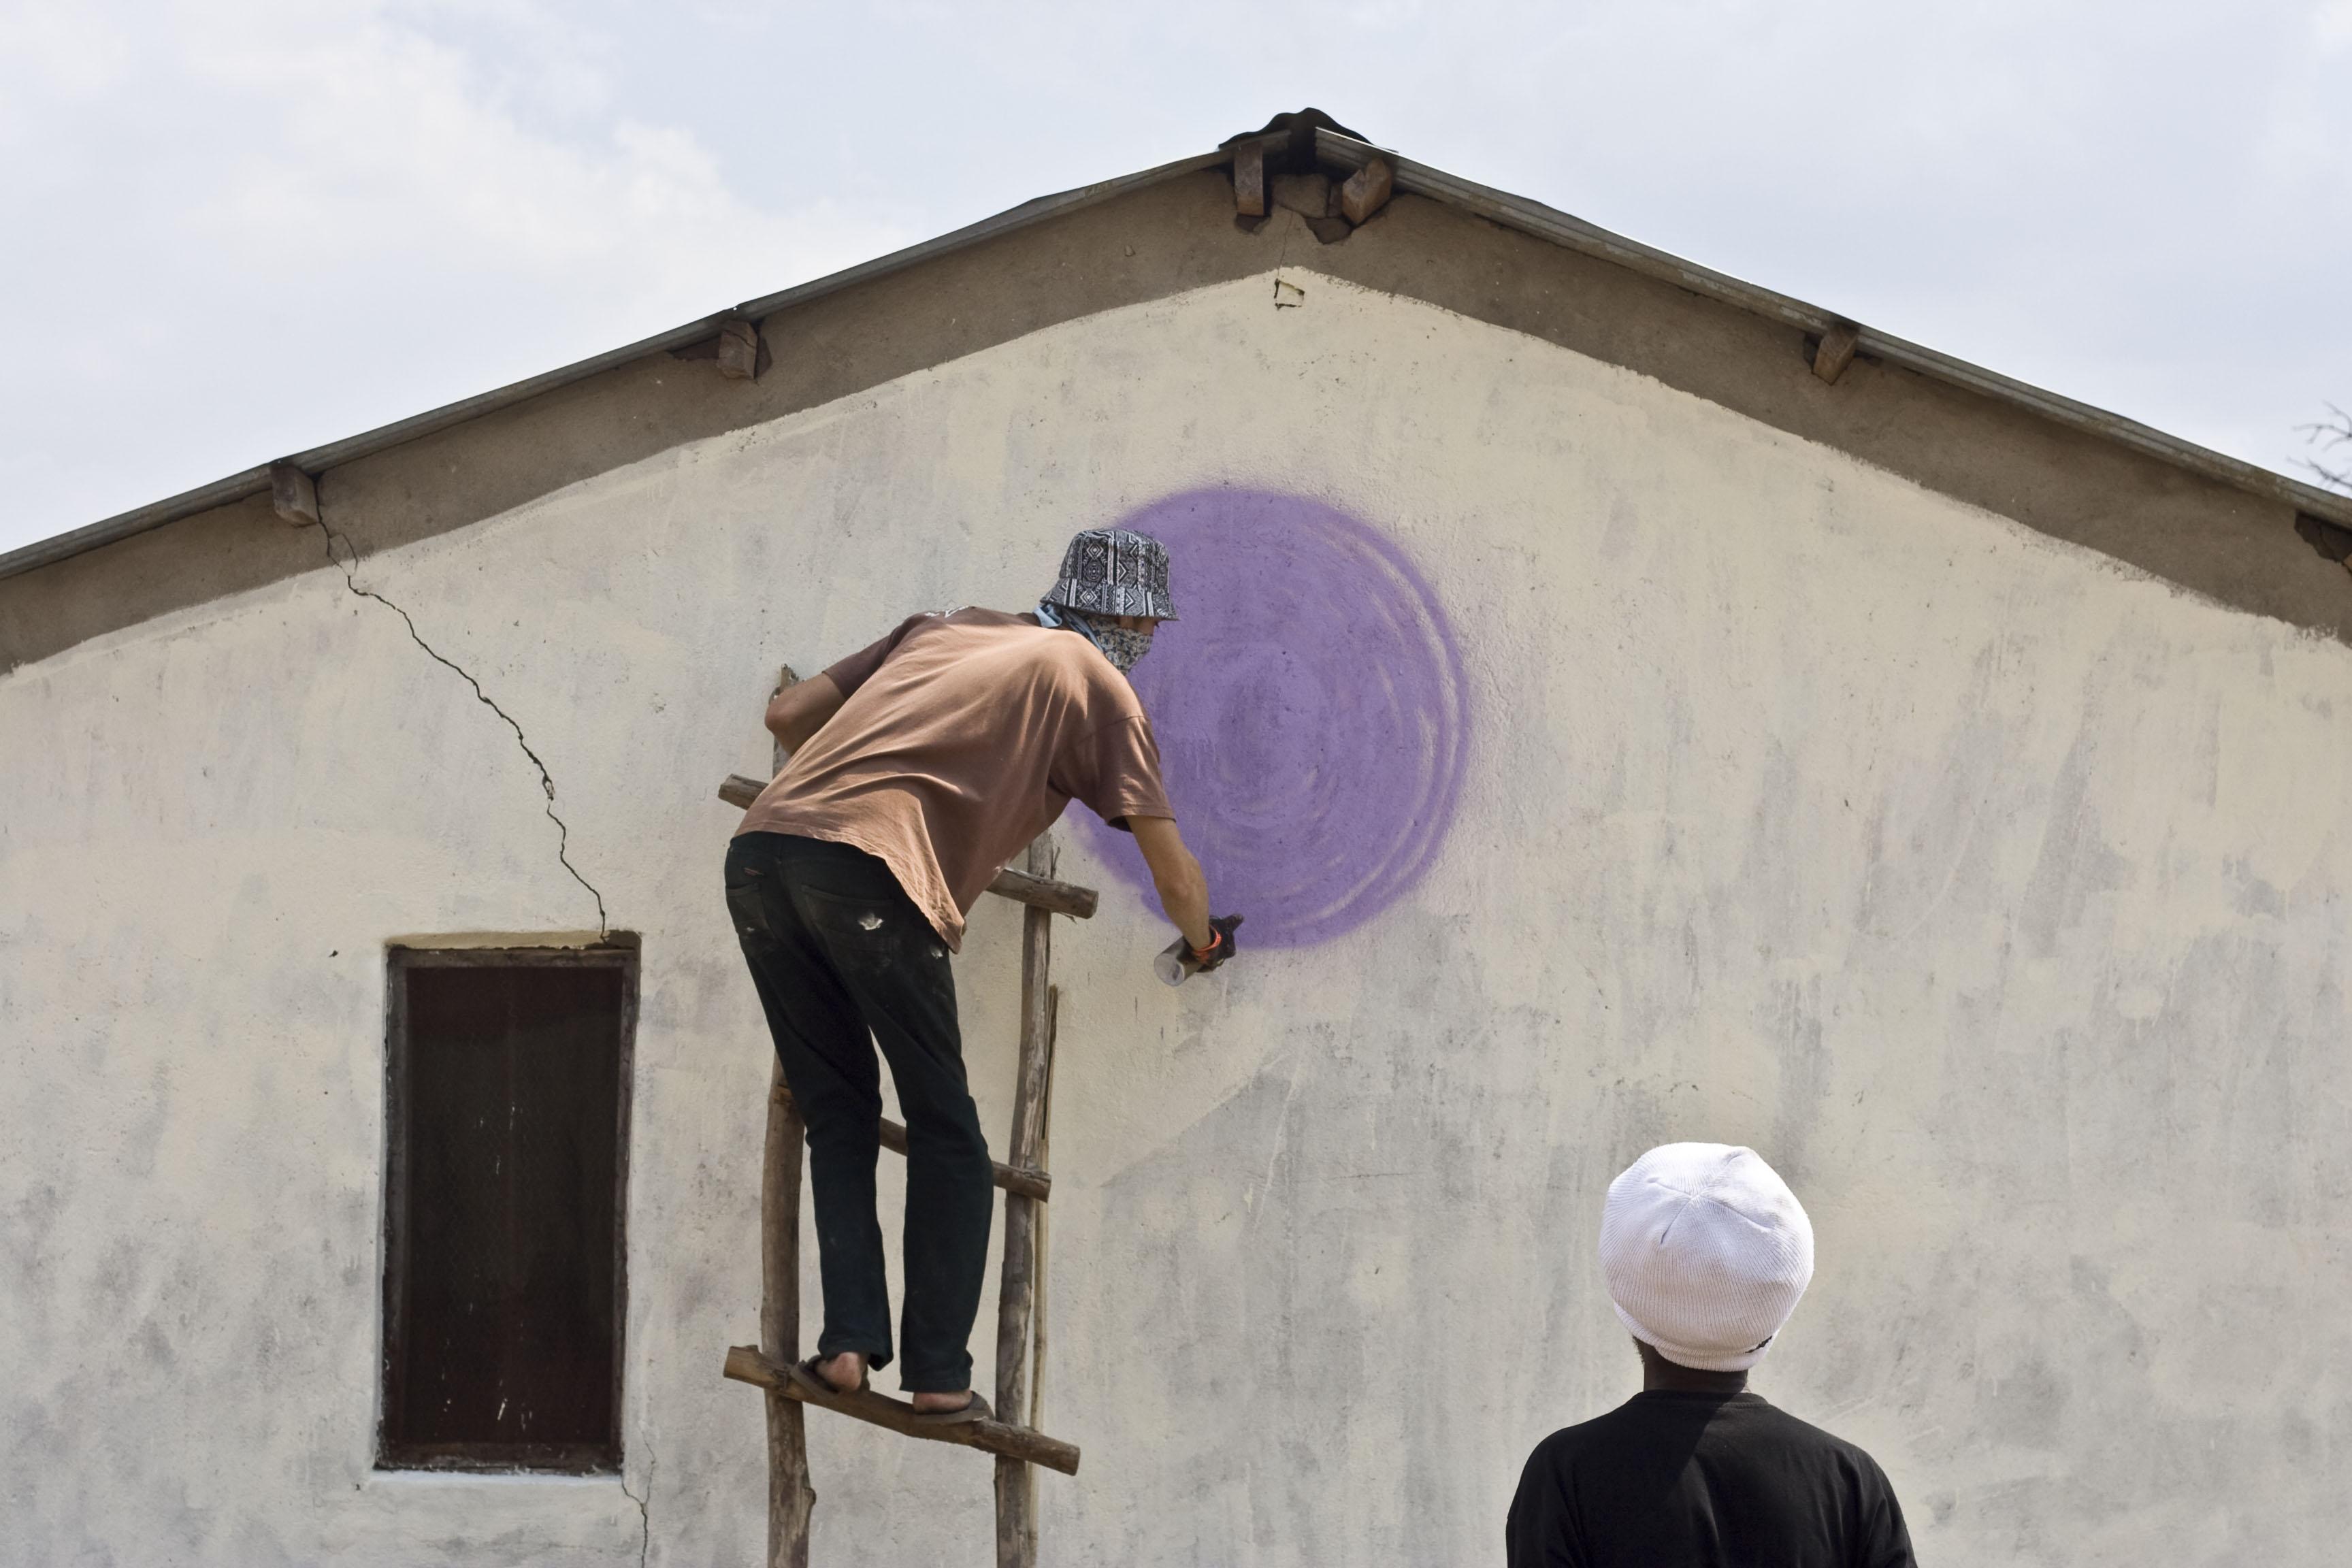 04 mook lion paints the moon_chipoka village_malawi © Robyn Perros